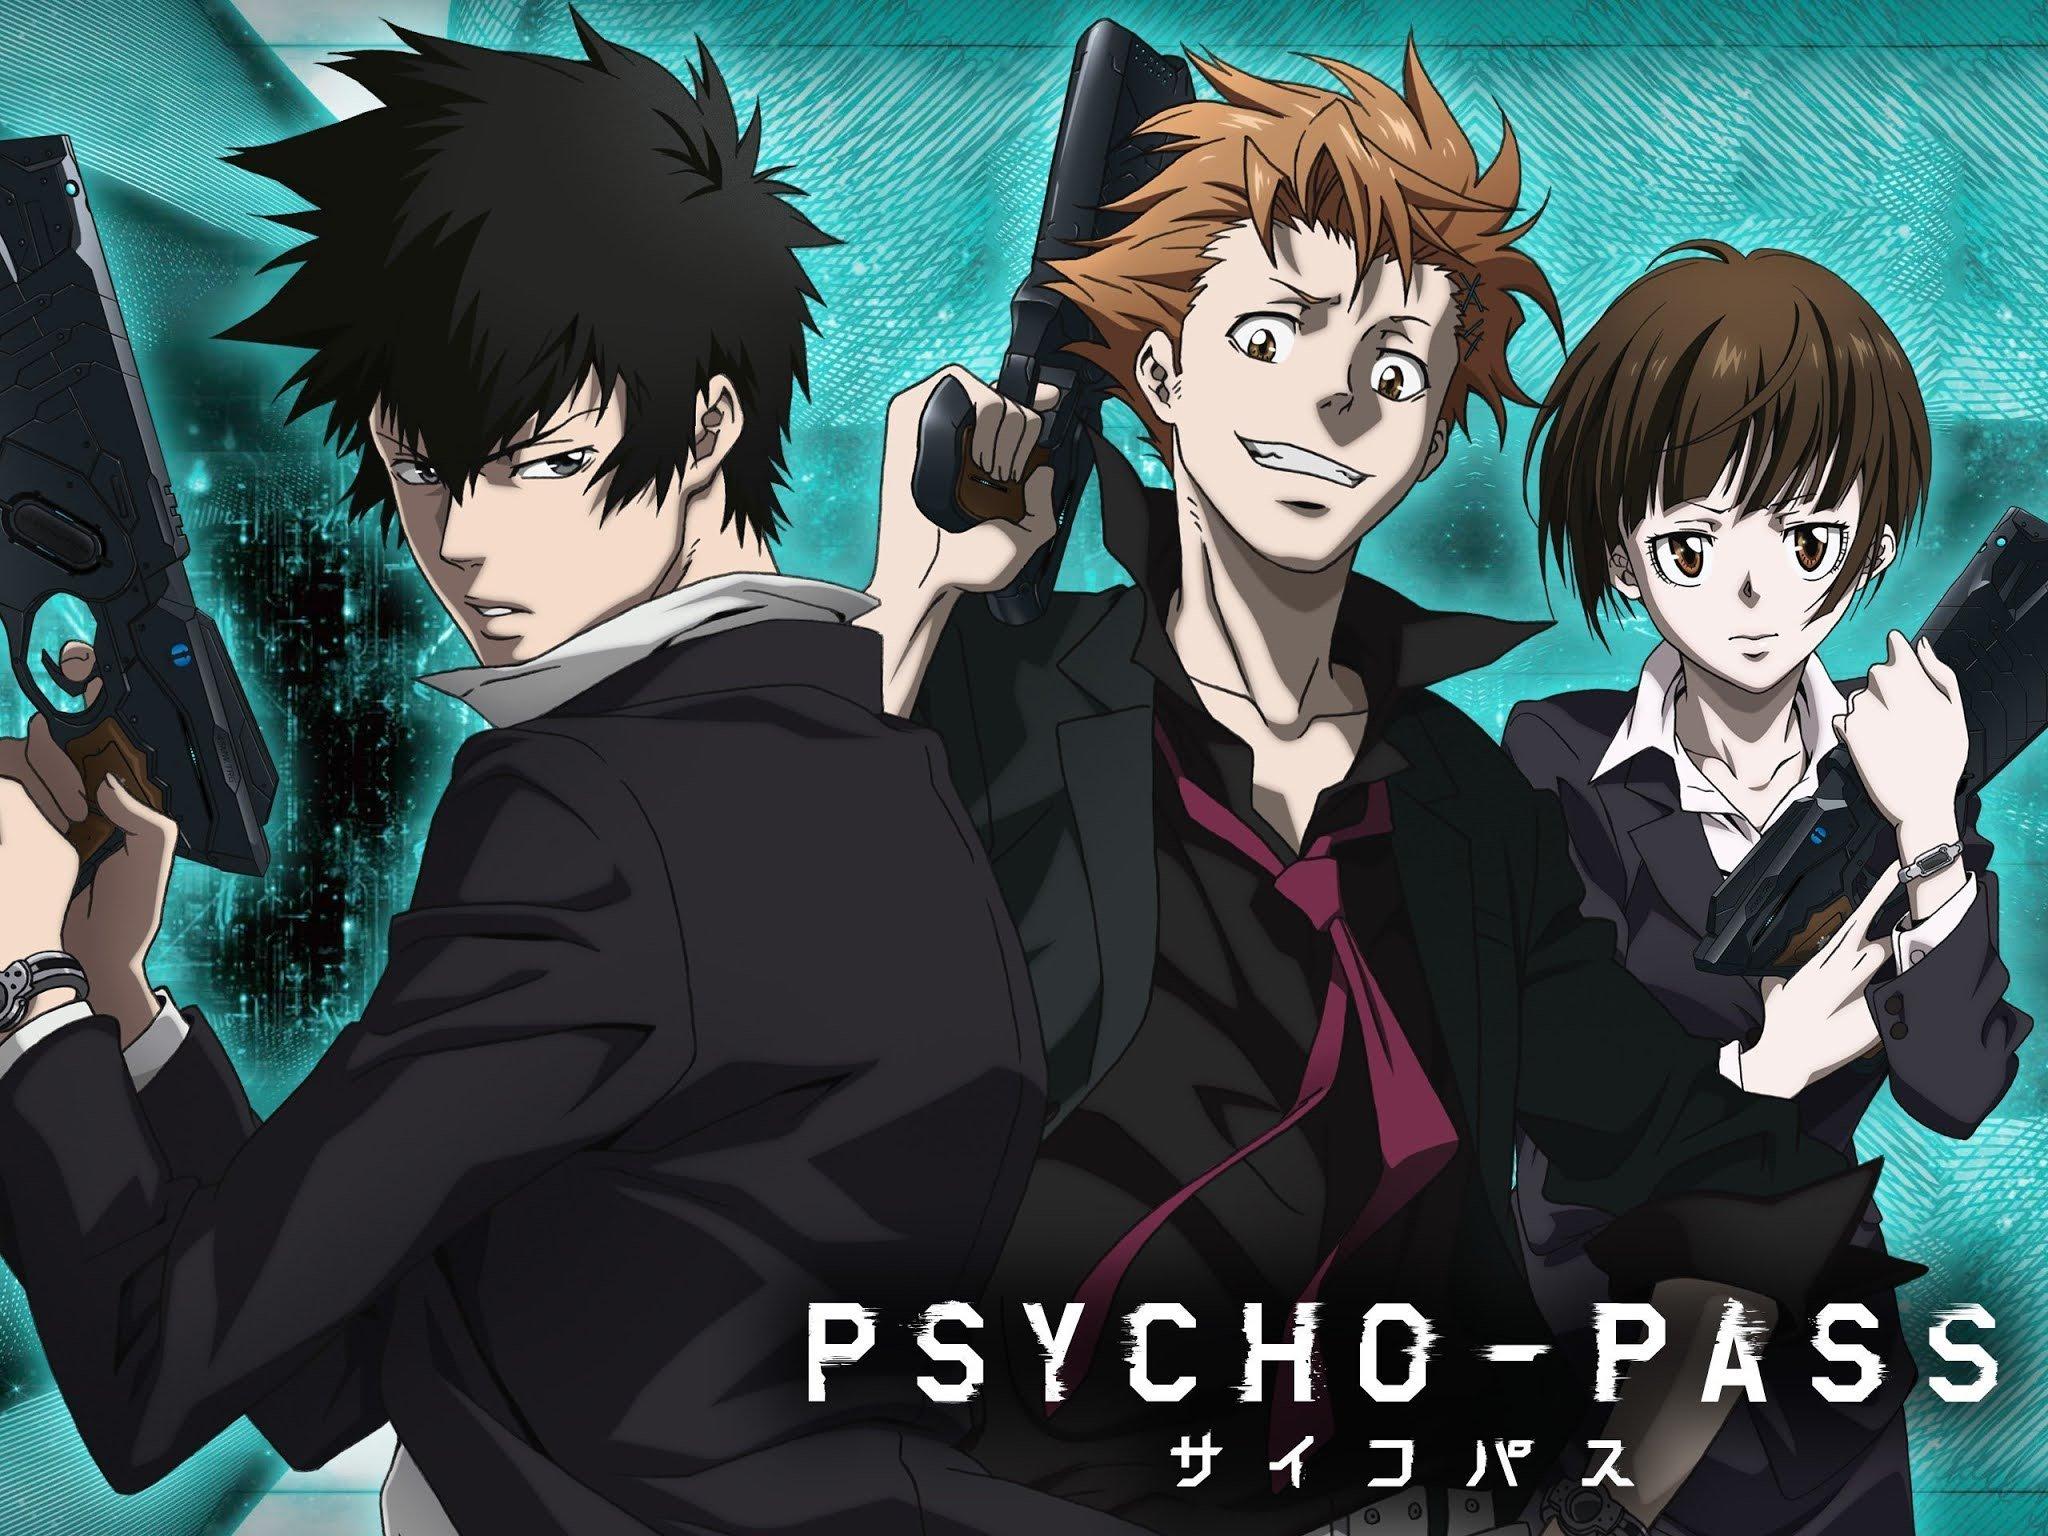 Personajes y películas anime netflix:akane psycho pass 2